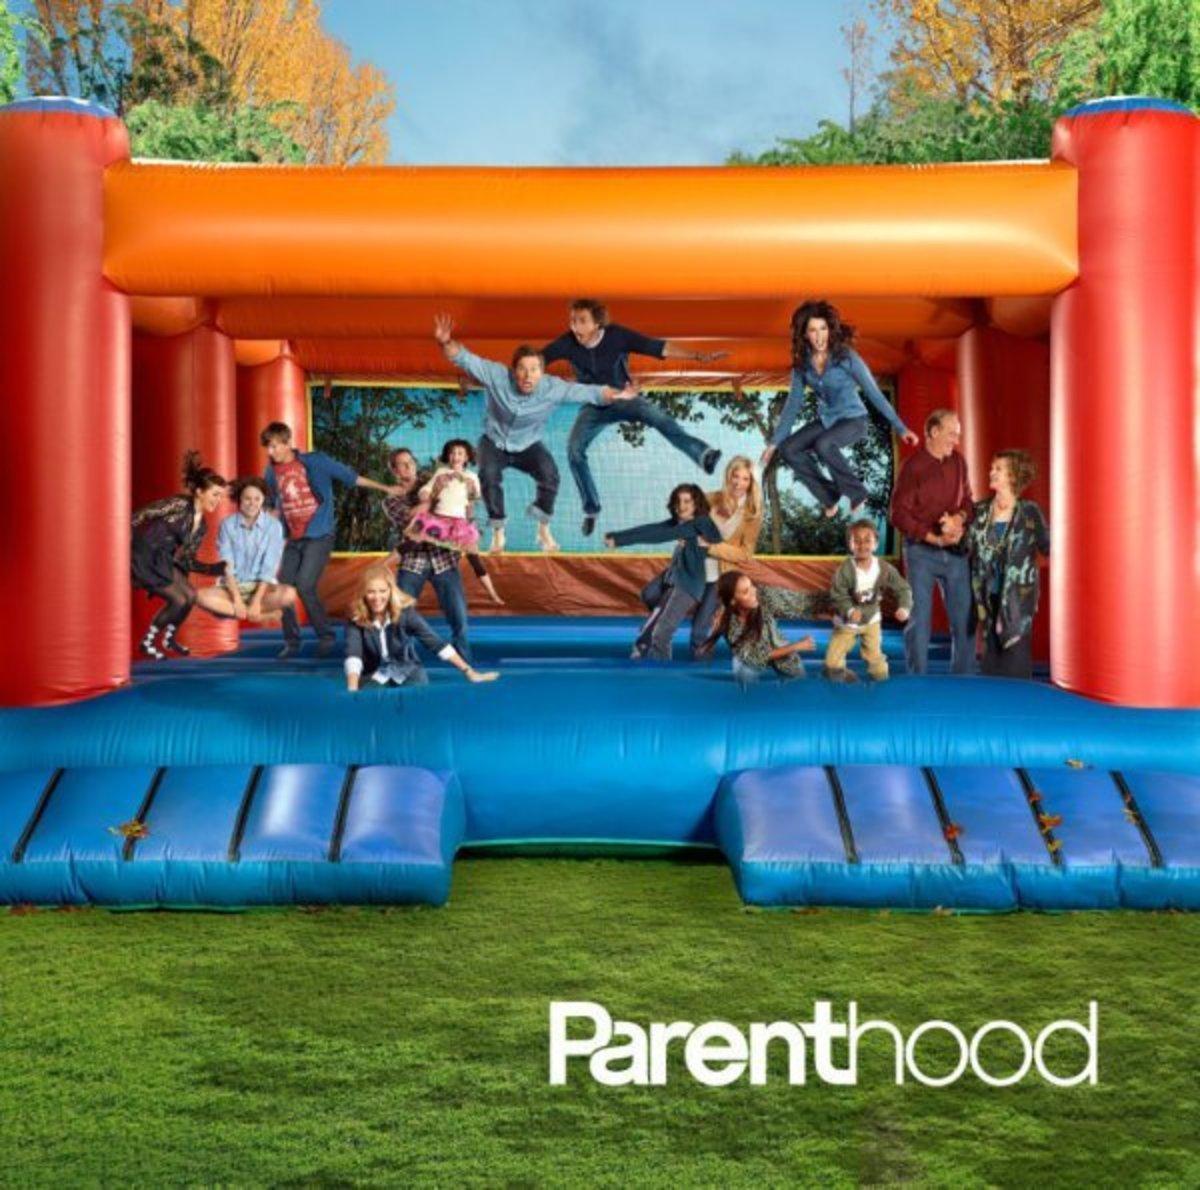 nbcs-parenthood-how-not-to-parent-a-kid-with-aspergers